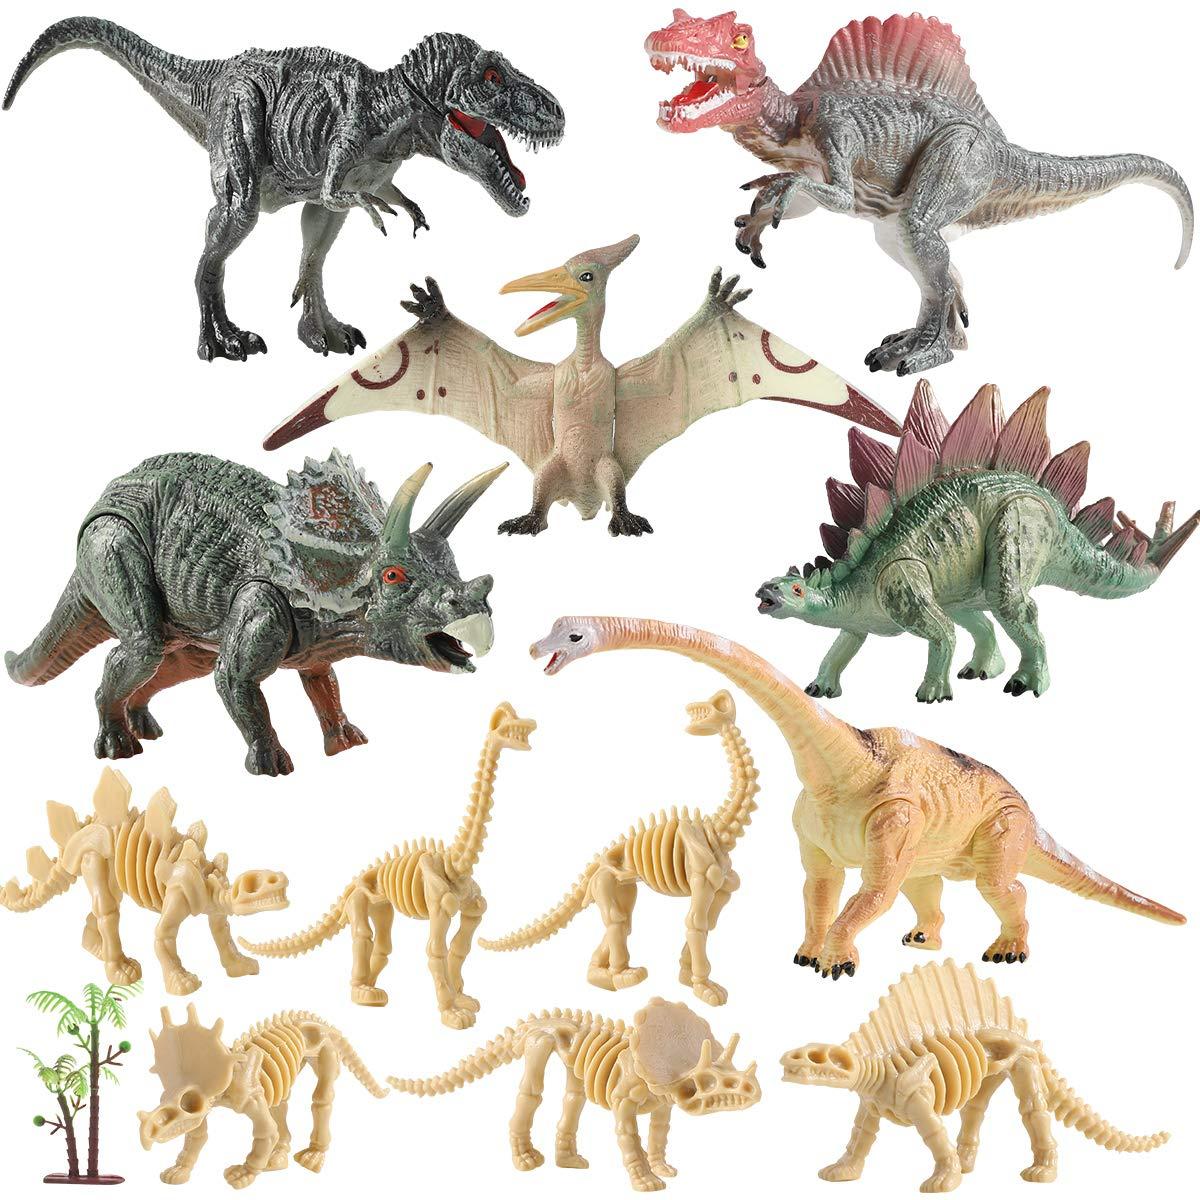 Geyiie 12pcs Dinosaur Toys Set, Realistic Dinosaurs Figures Party Supplies Playset